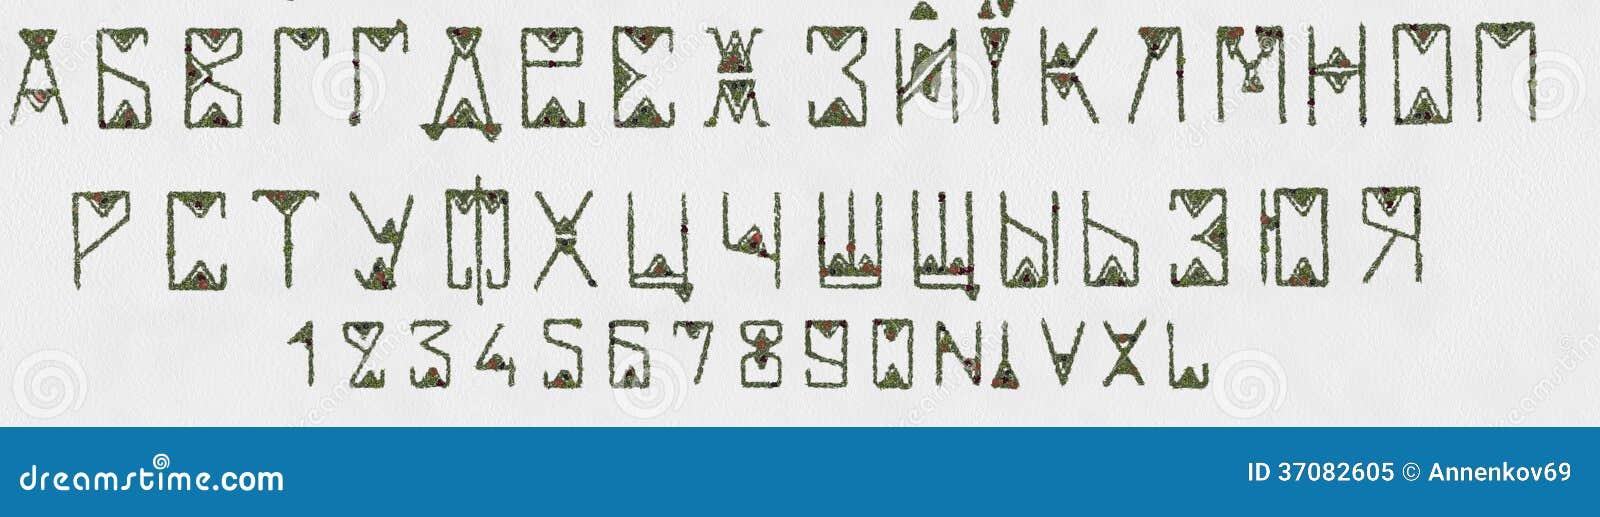 Russian Cyrillic Fonts Free